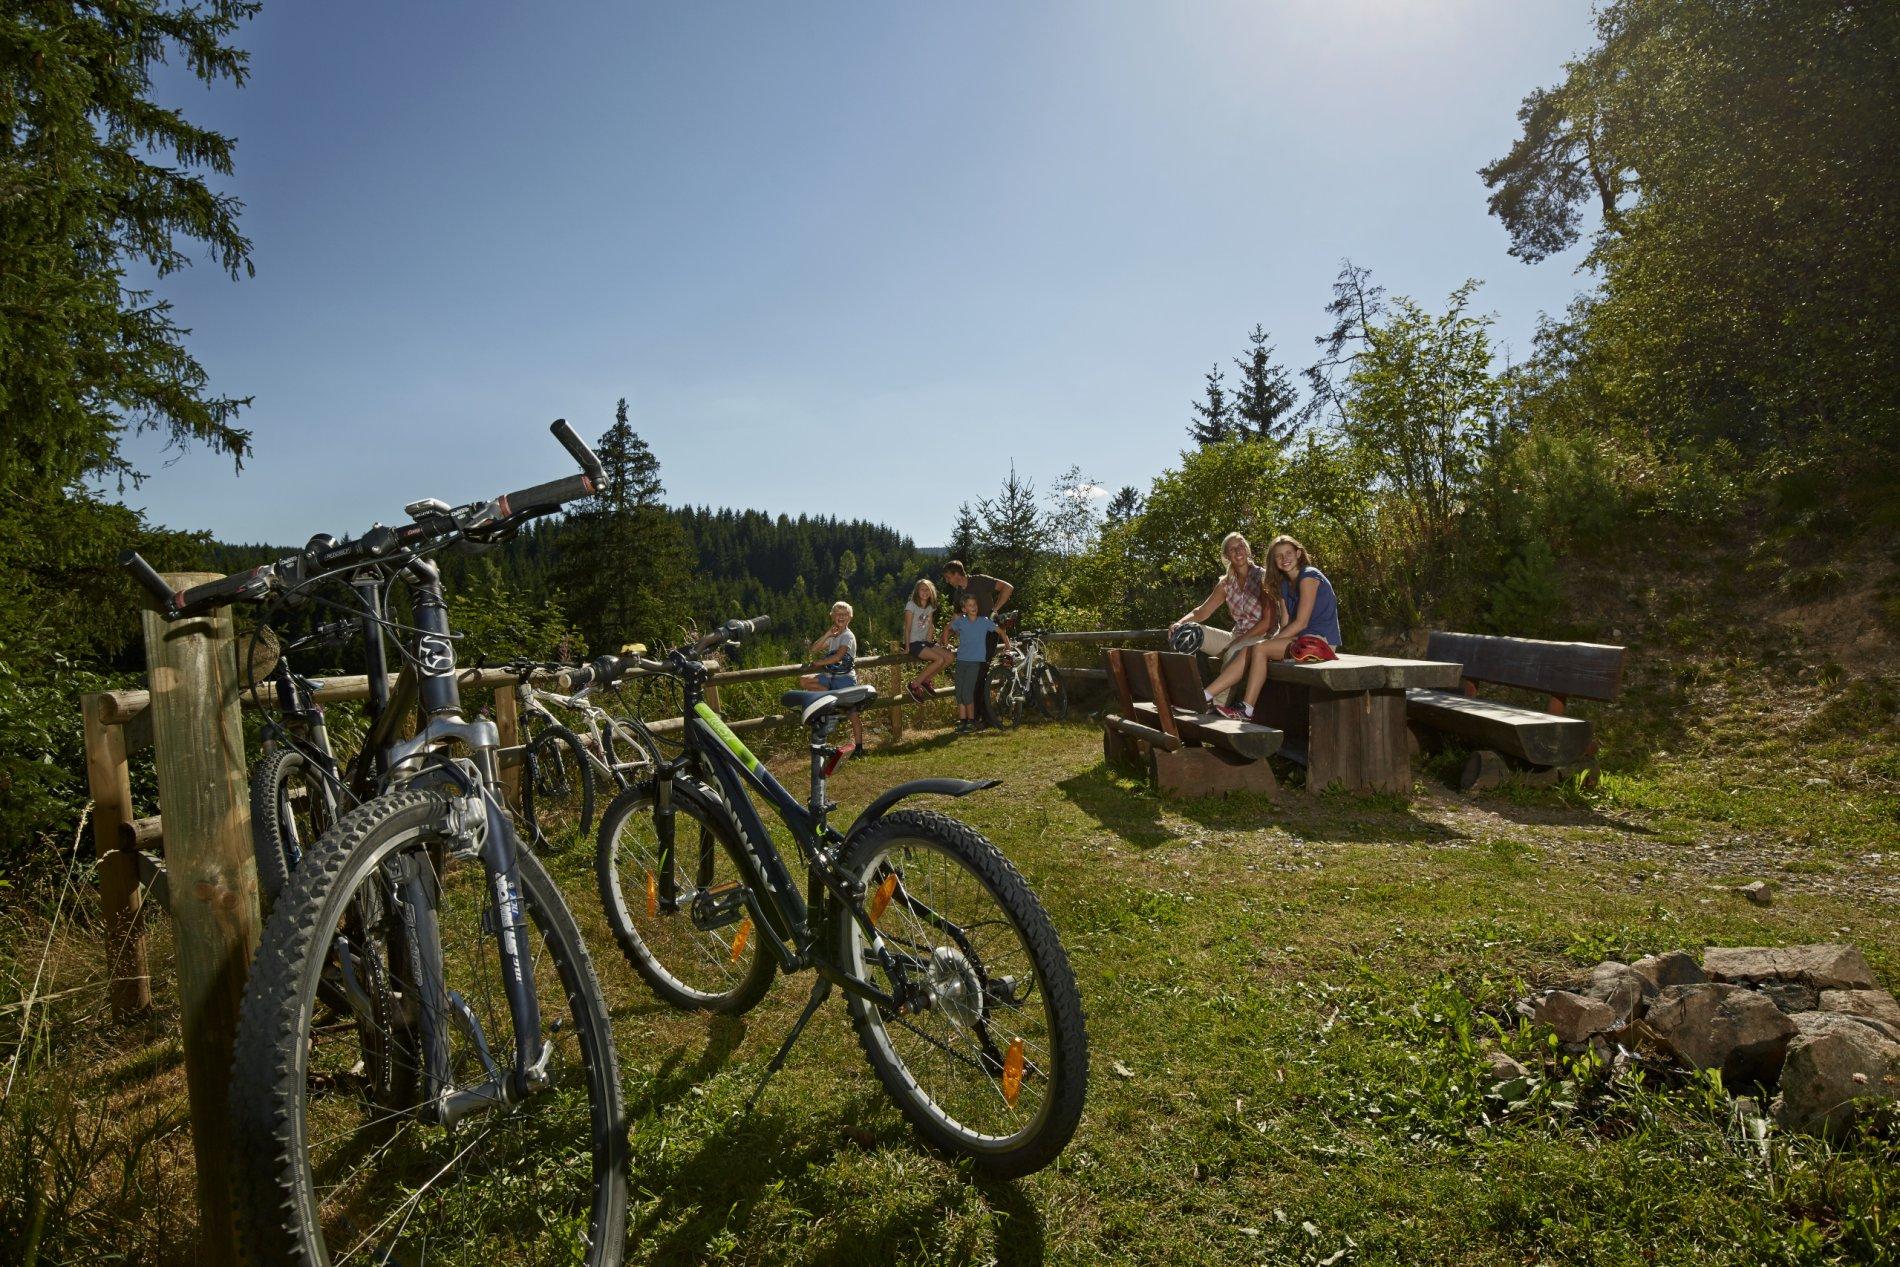 Familie macht Pause bei der Fahrradtour